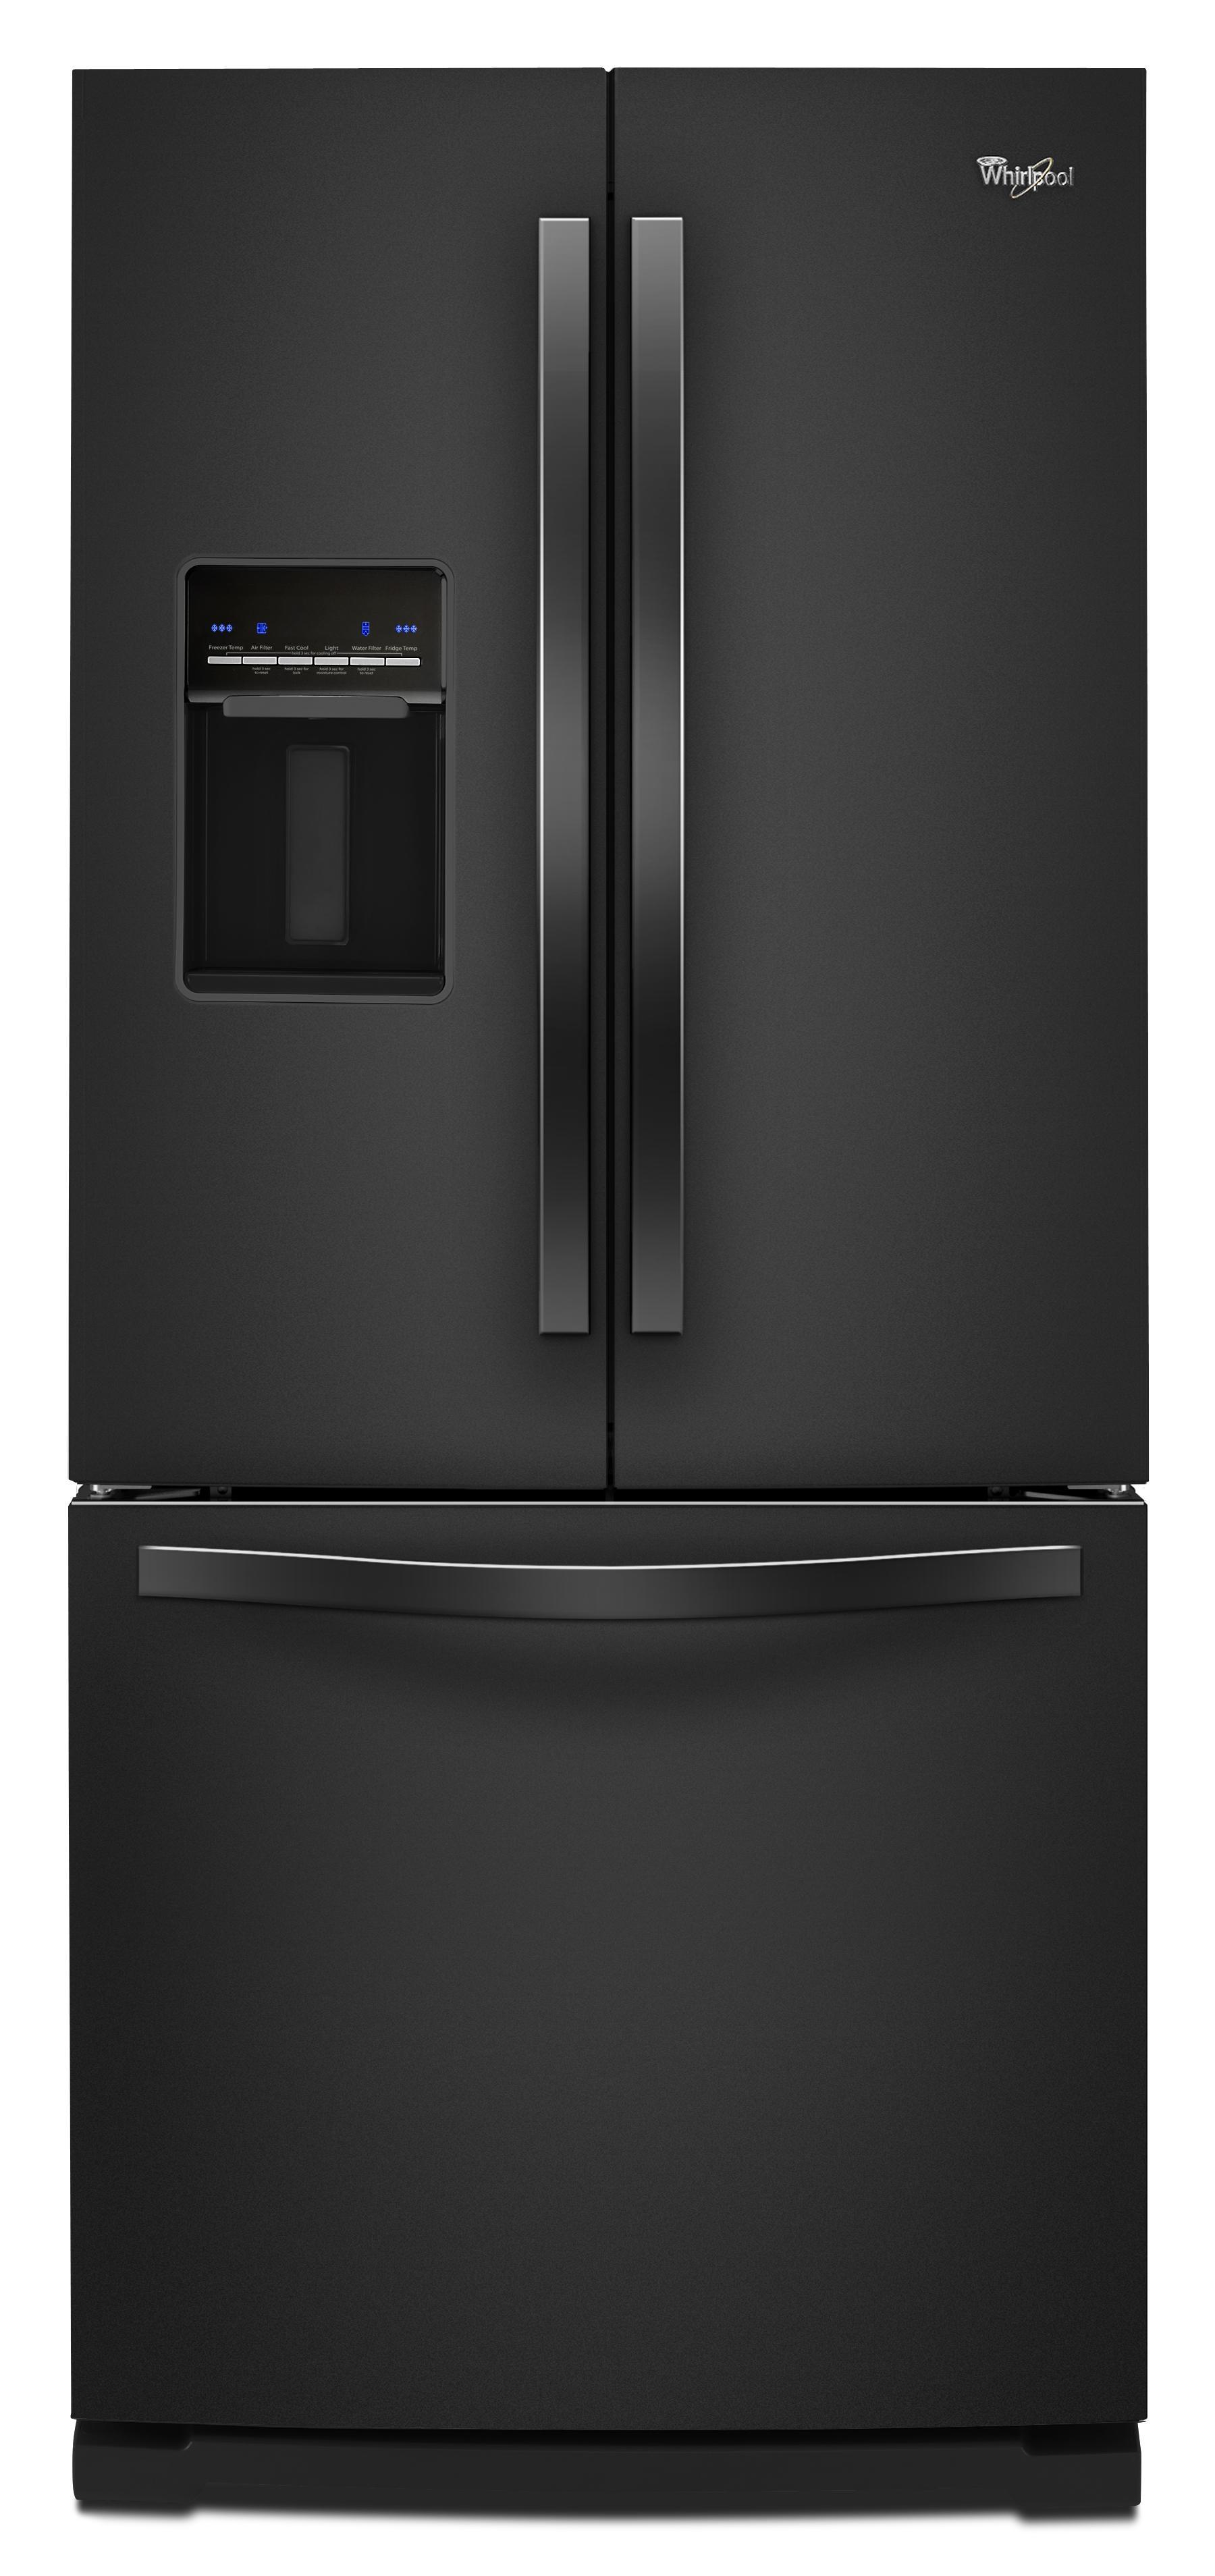 Whirlpool French Door Refrigerators 19.6 Cu. Ft. French-Door Refrigerator - Item Number: WRF560SEYB